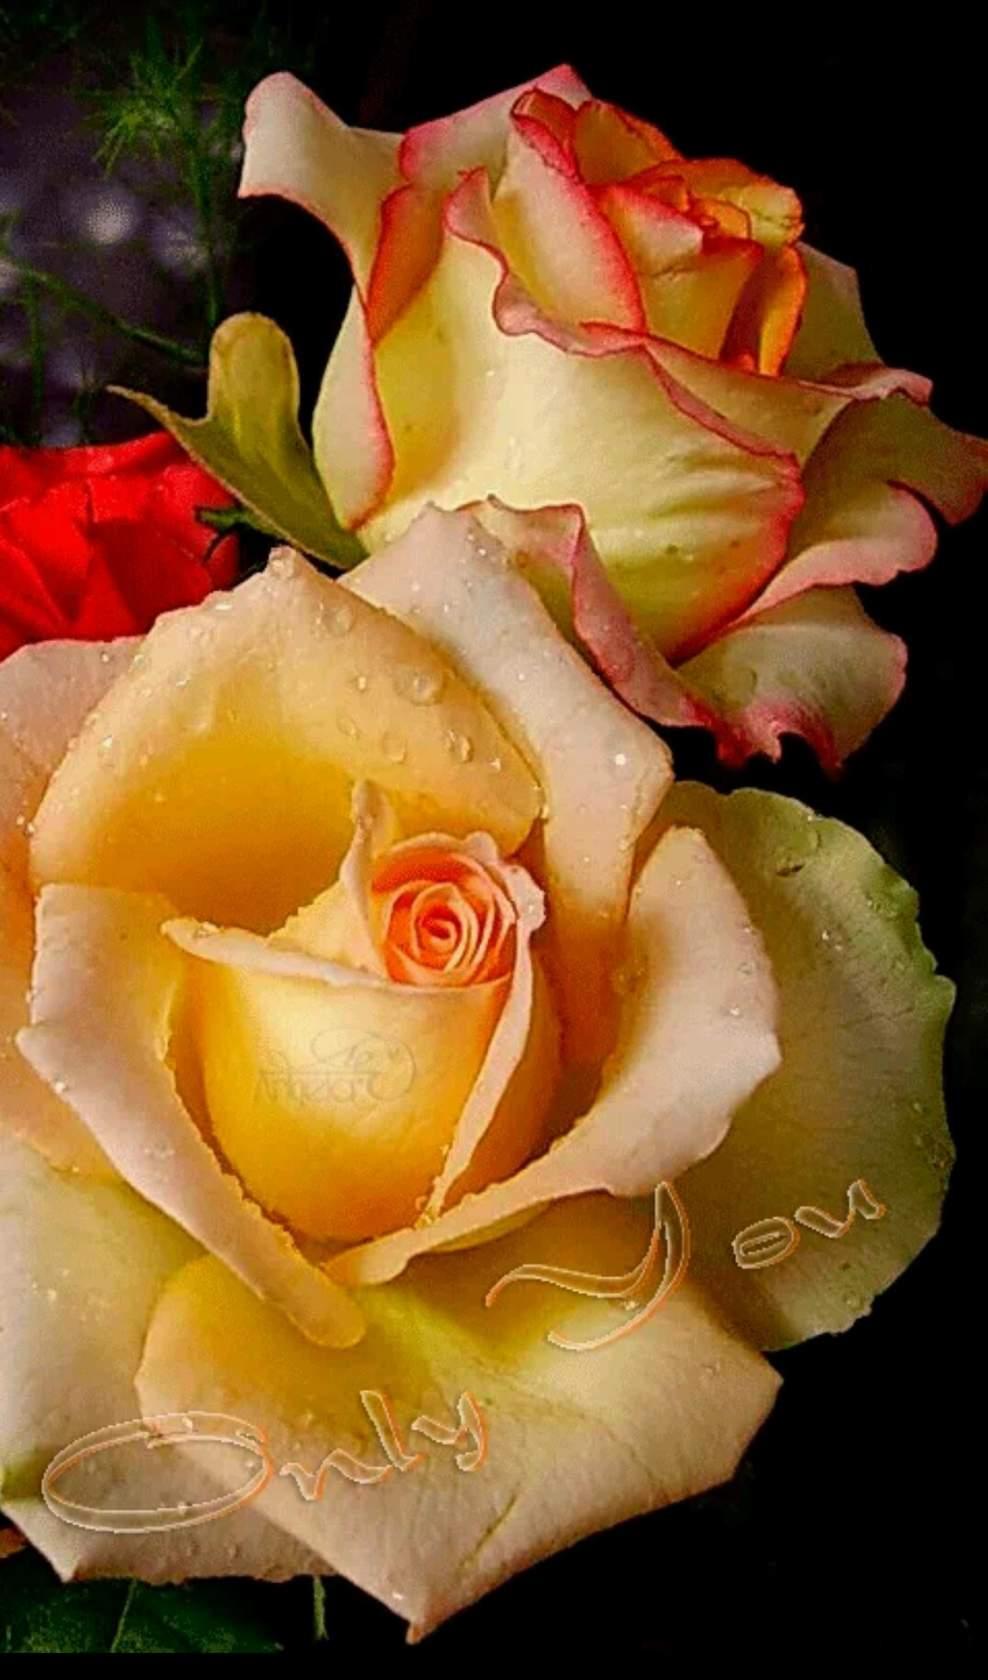 yellow love rose - HD891×1484